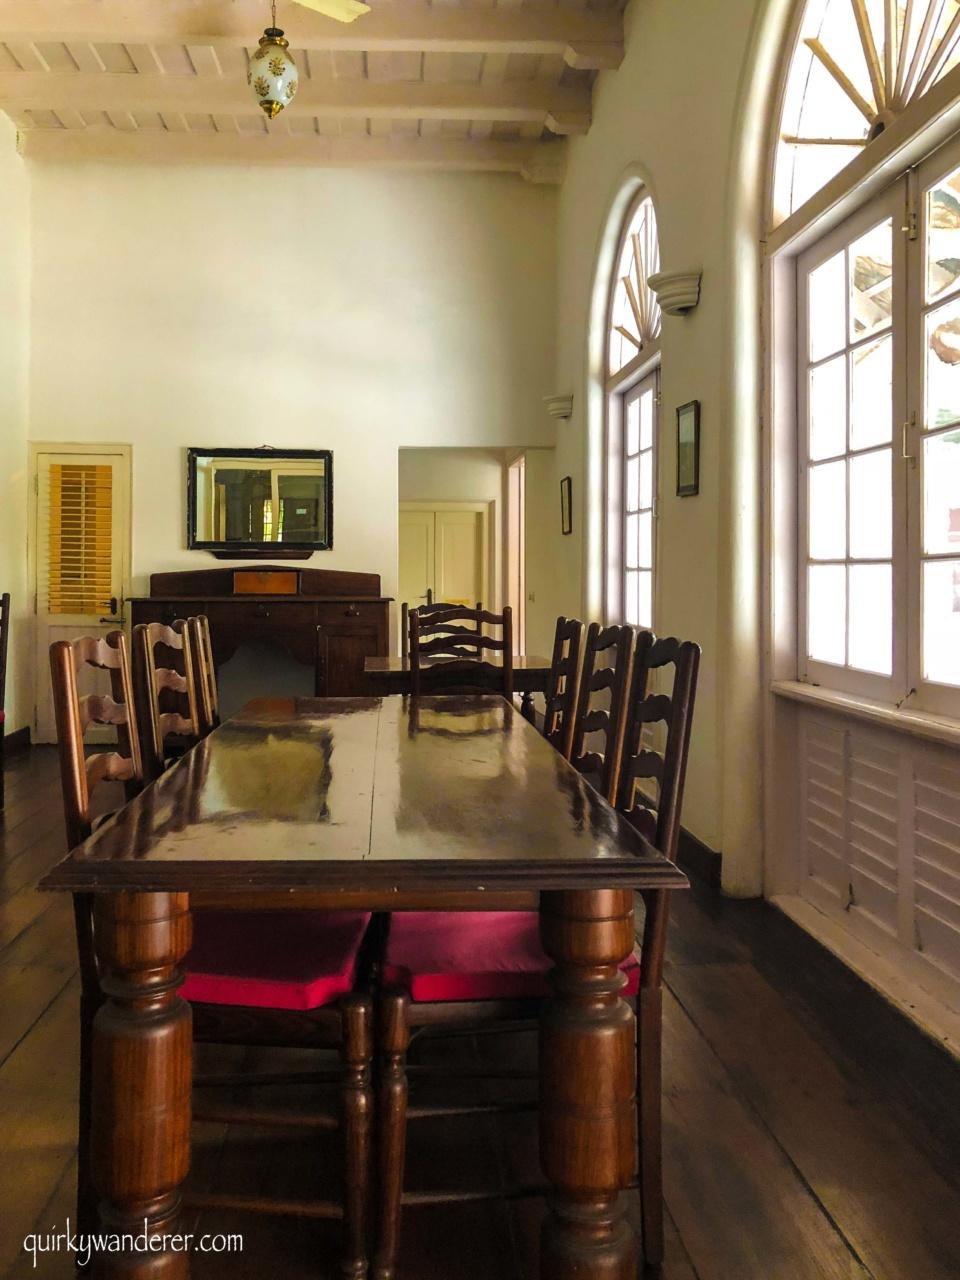 Colonial houses in Kochi